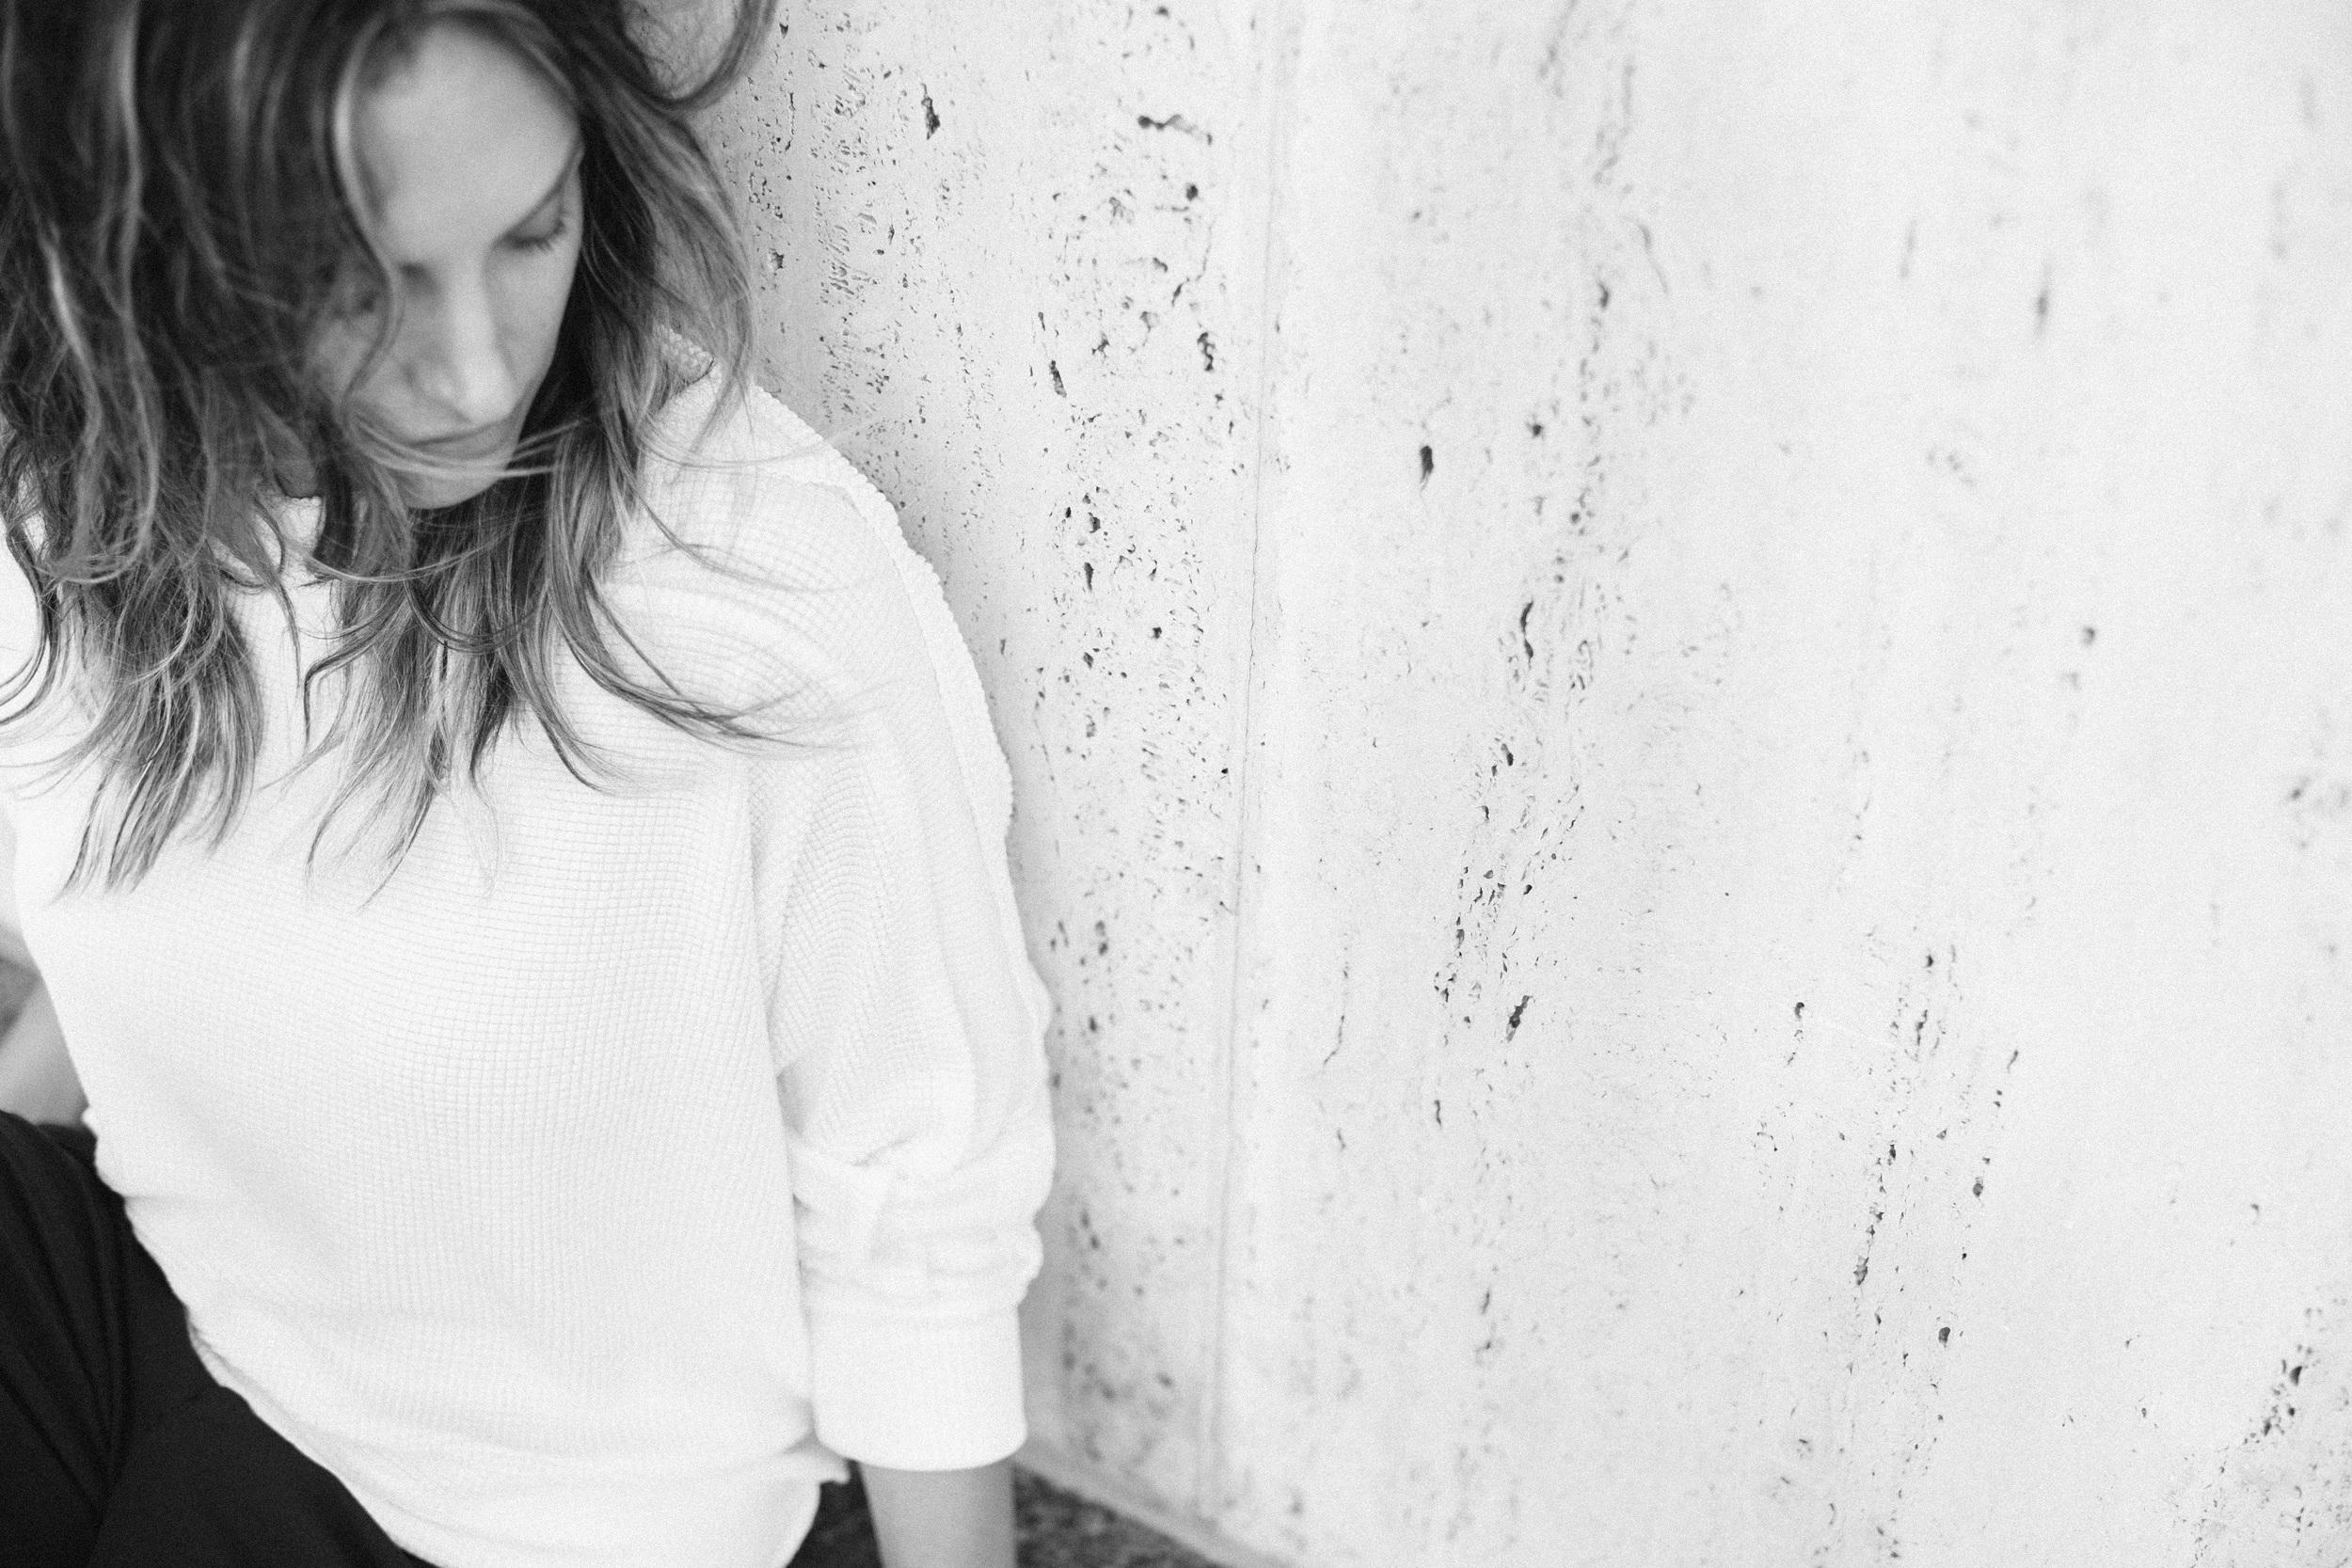 Paige-Newton-Imagery-fashion-photographer-kickpleat-lookbook.jpg